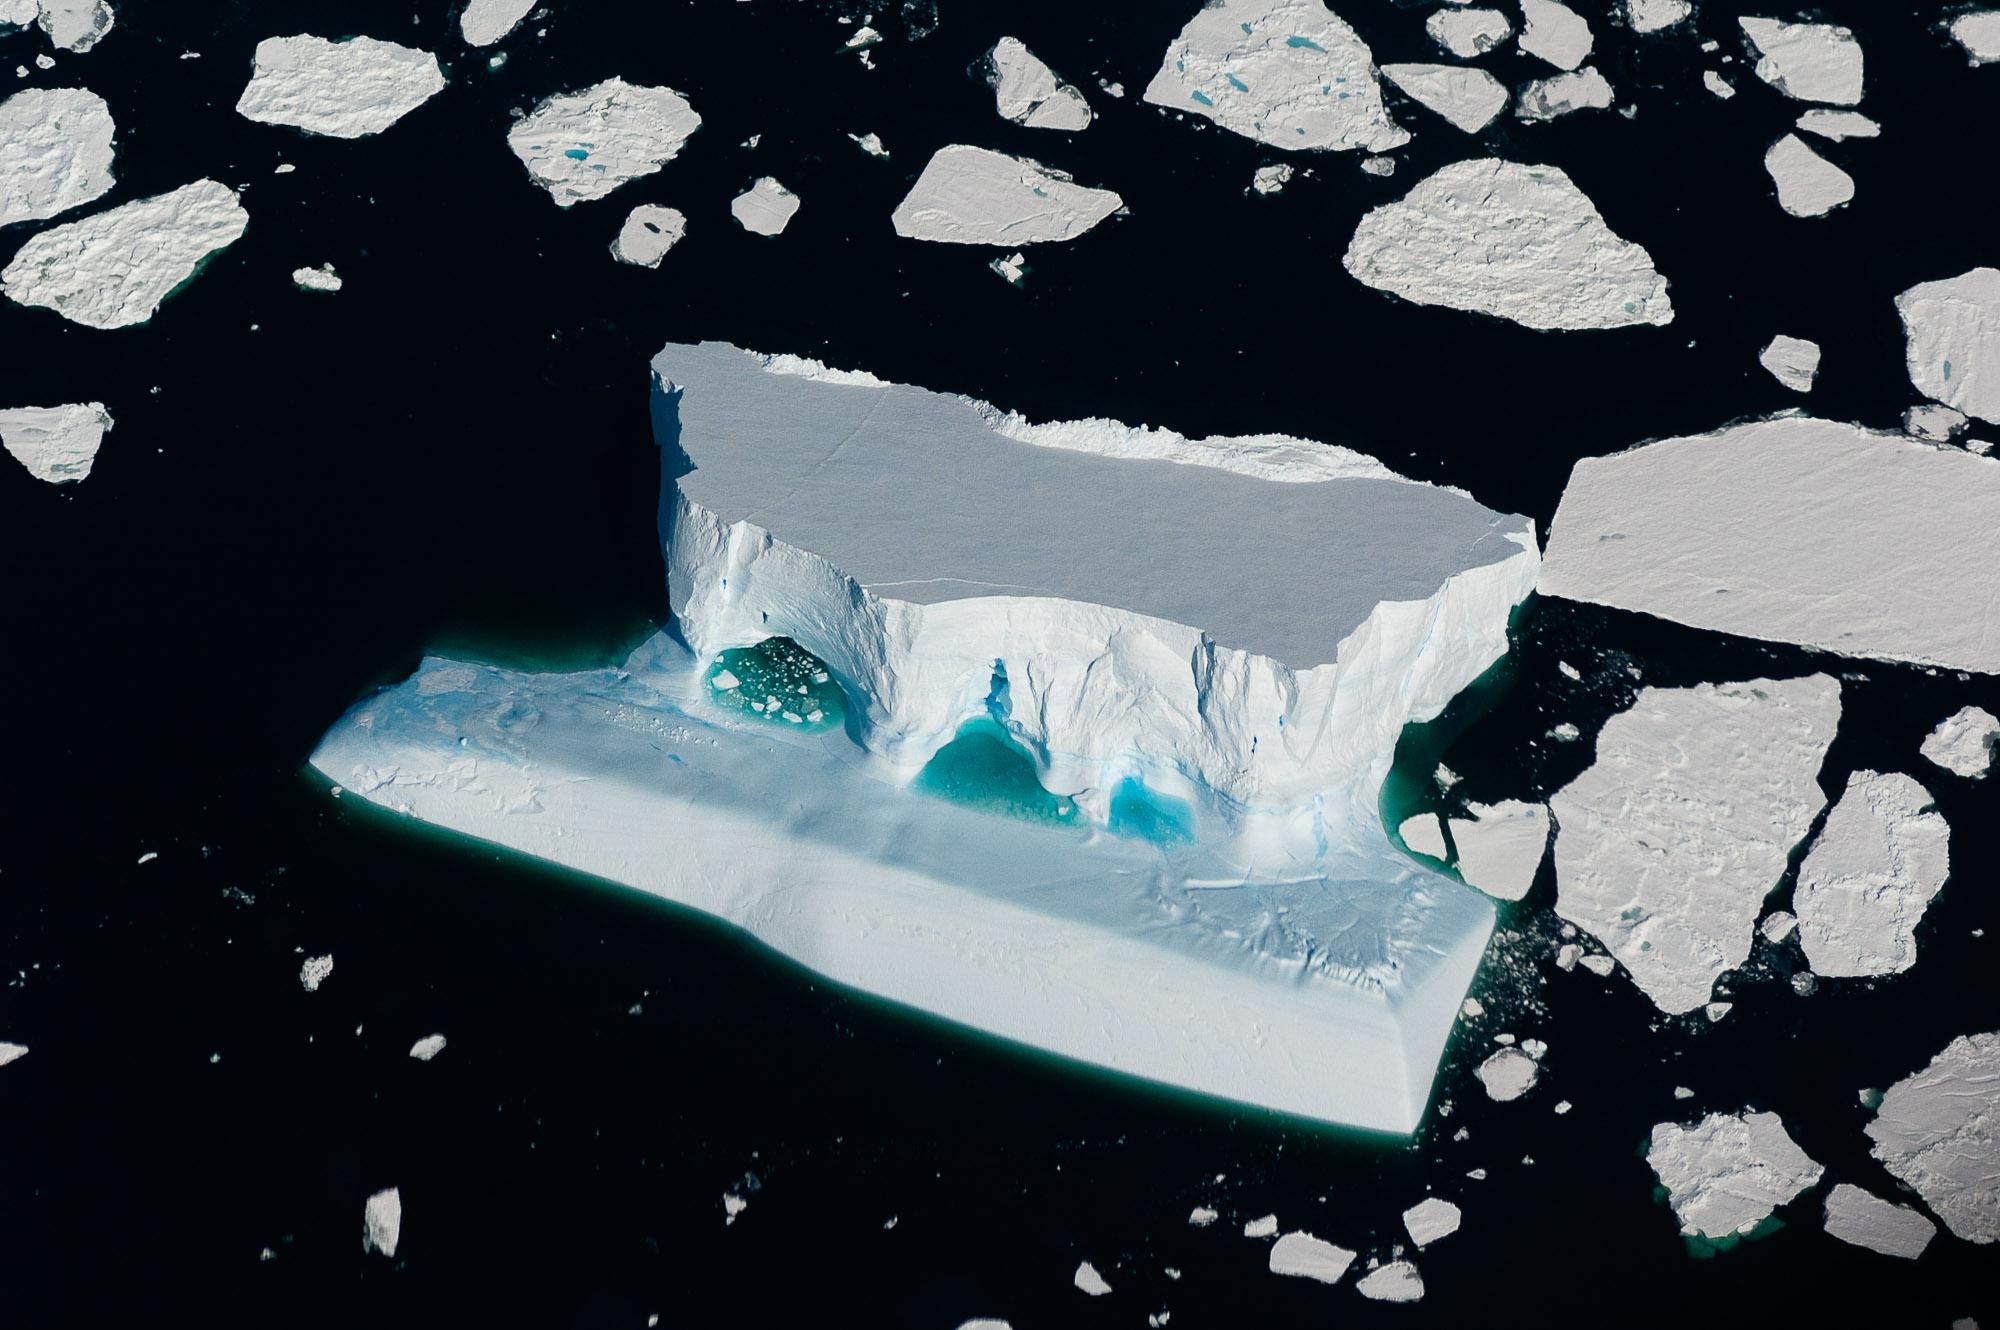 Prydz Bay, Antarctica. © www.thomaspickard.com